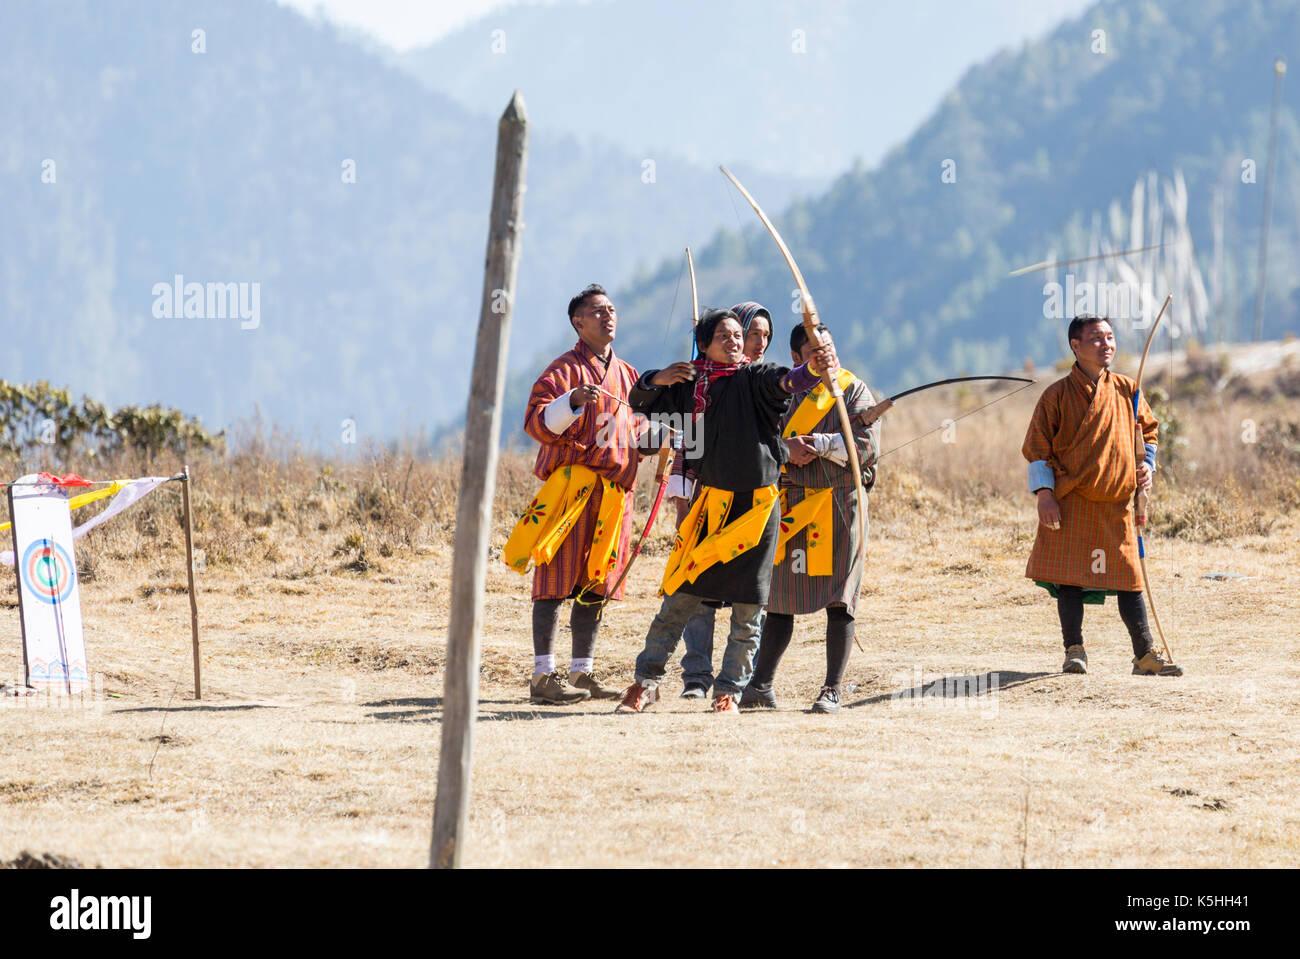 Local archery competition in Phobjikha Valley, Western Bhutan Stock Photo